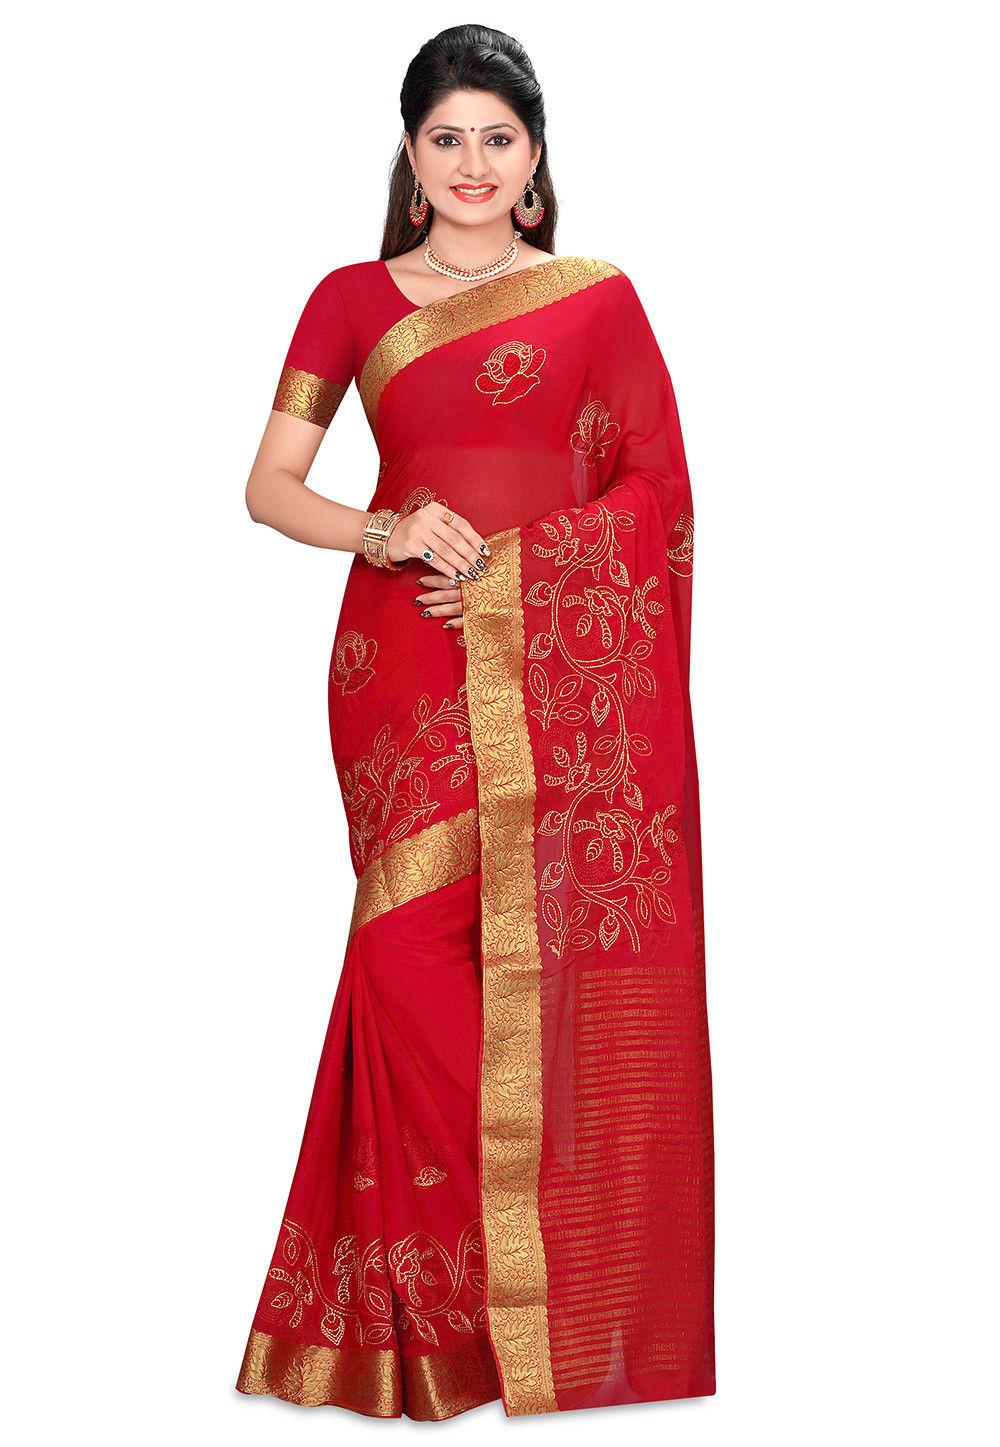 Embroidered Mysore Chiffon Saree in Red